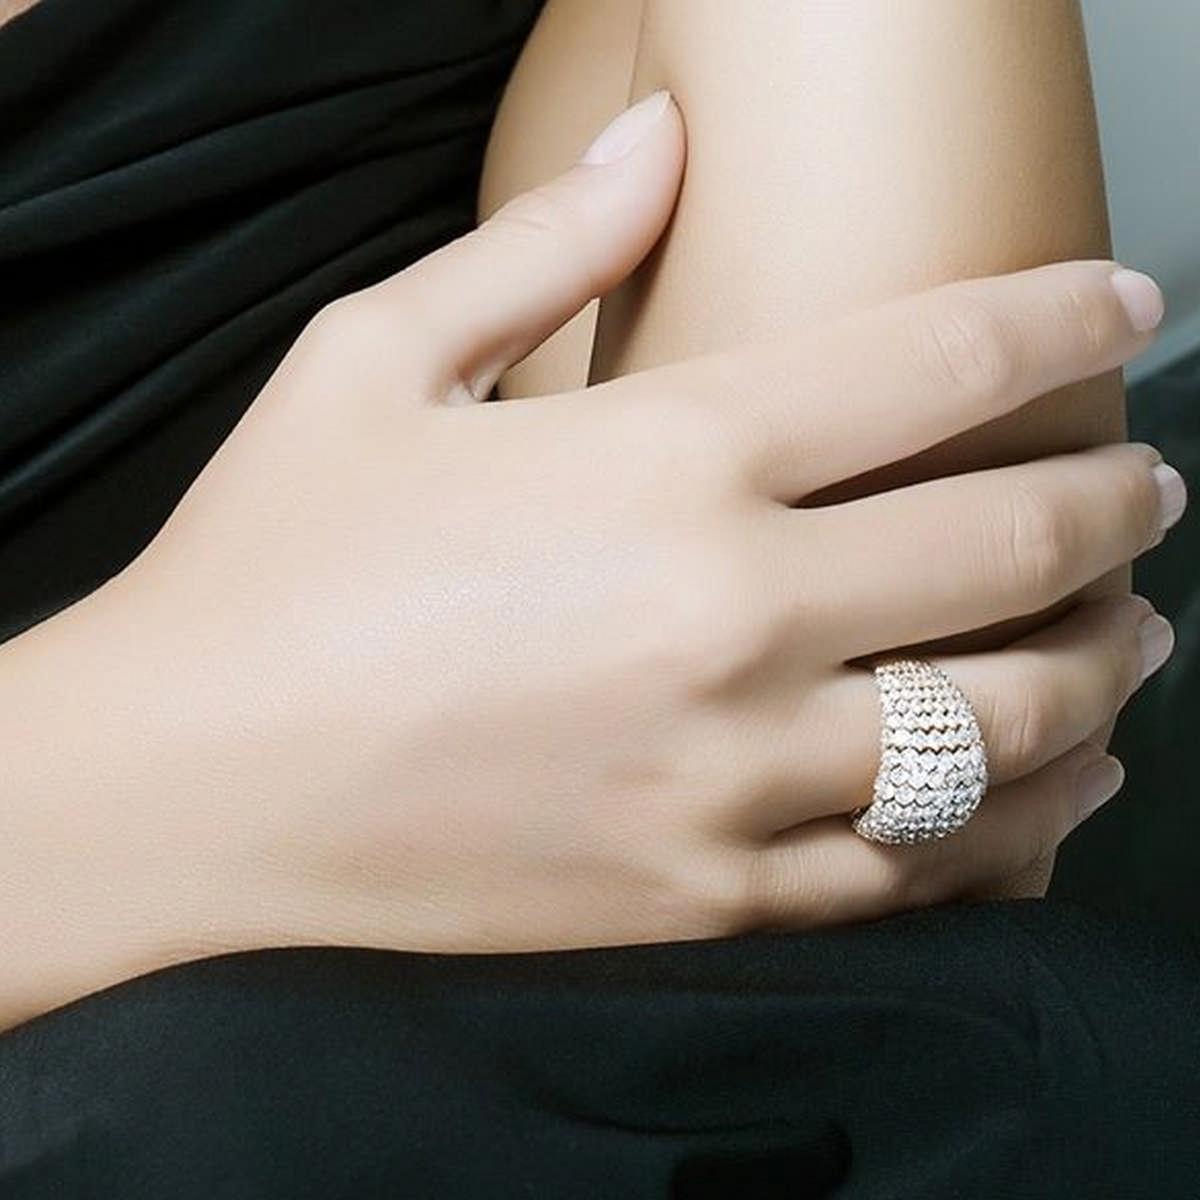 sofia-gioielli-007